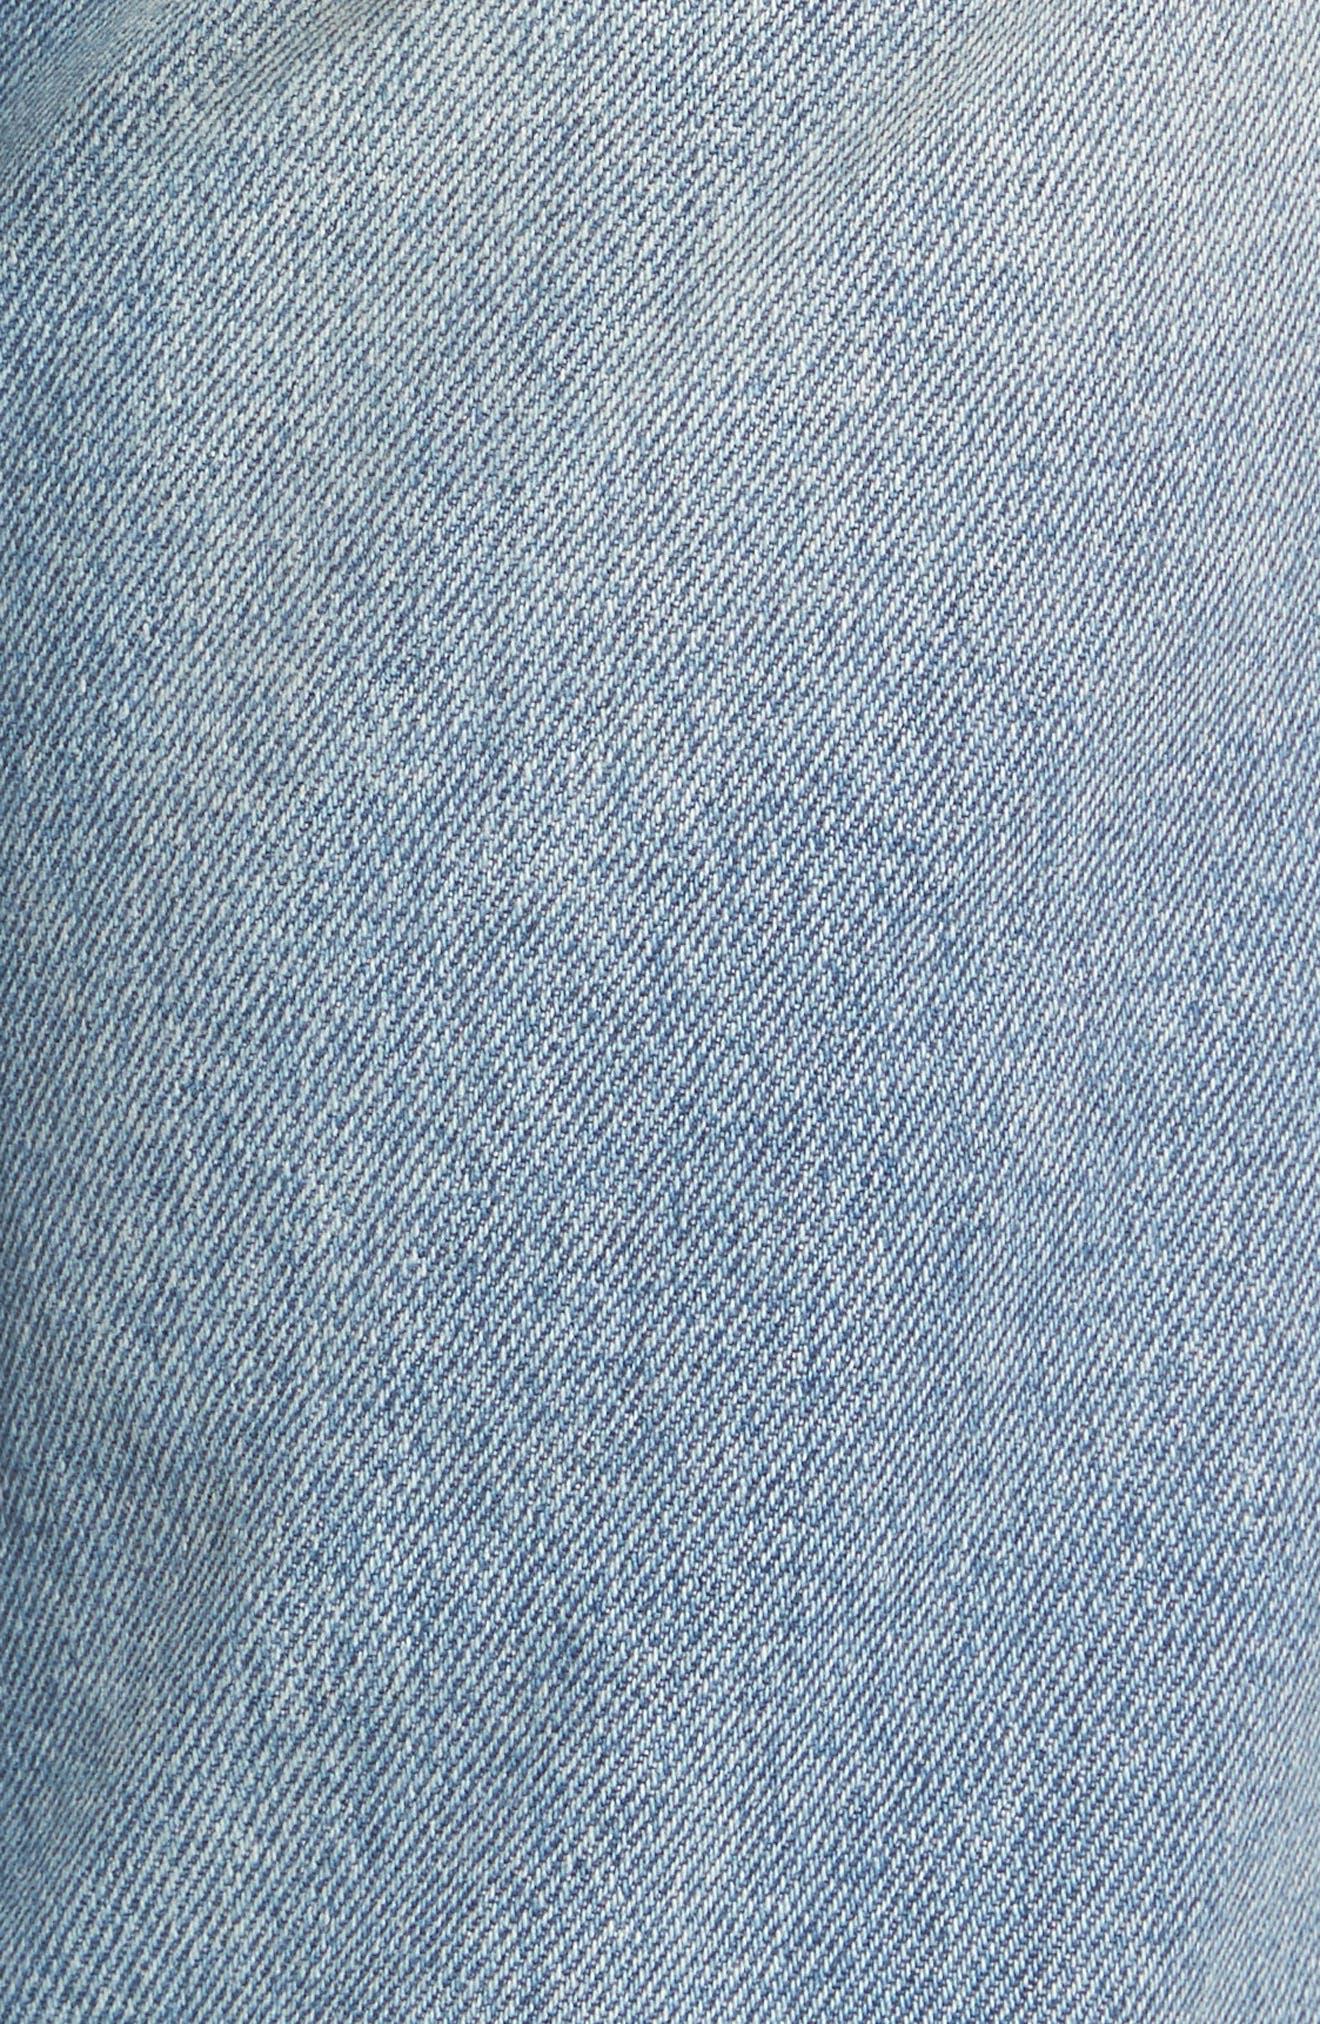 Alternate Image 5  - Obey Sundays Straggler High Waist Jeans